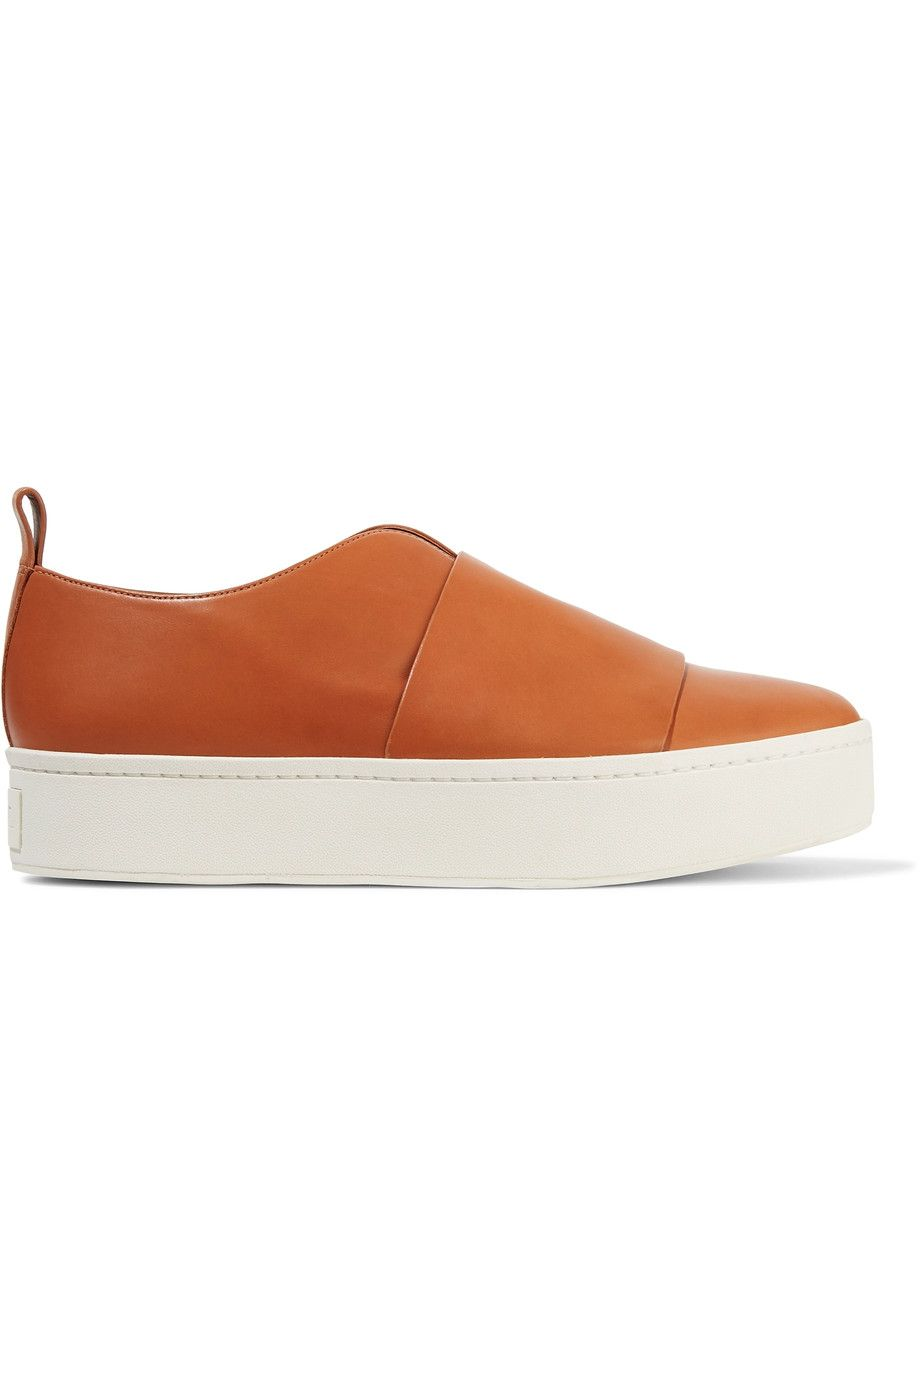 c3788d93550 VINCE Wallace leather platform slip-on sneakers.  vince  shoes ...